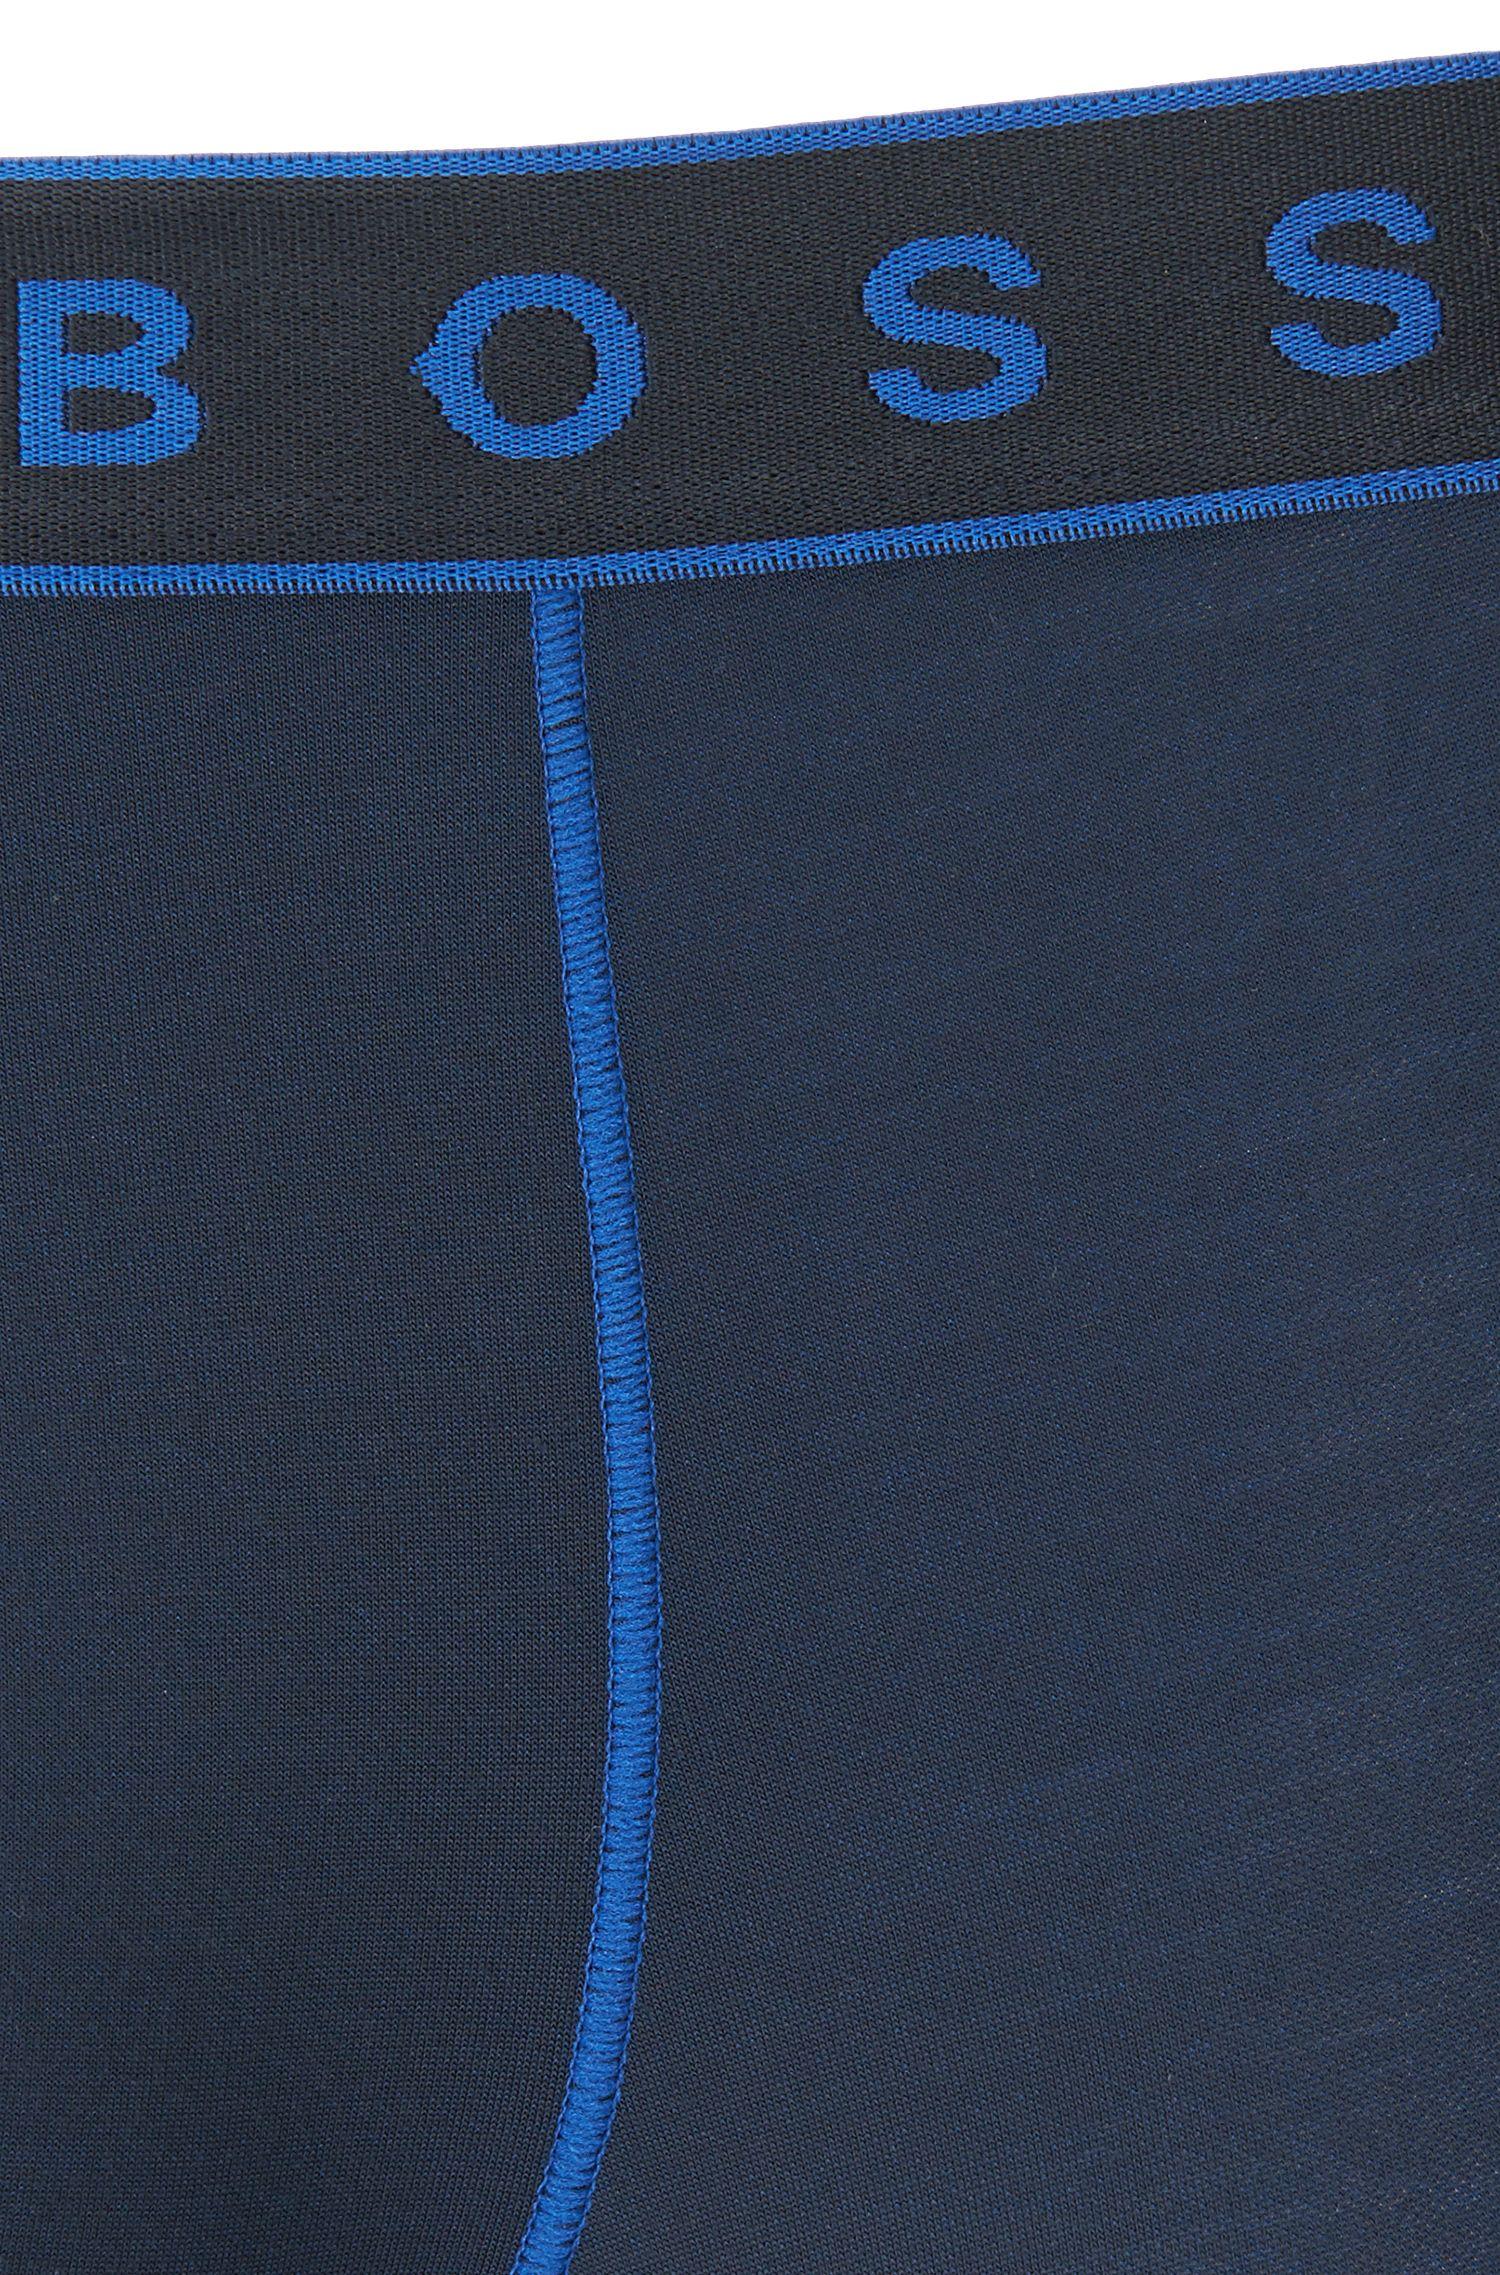 Microfiber Boxer Brief | Boxer Brief 2 Tone, Dark Blue